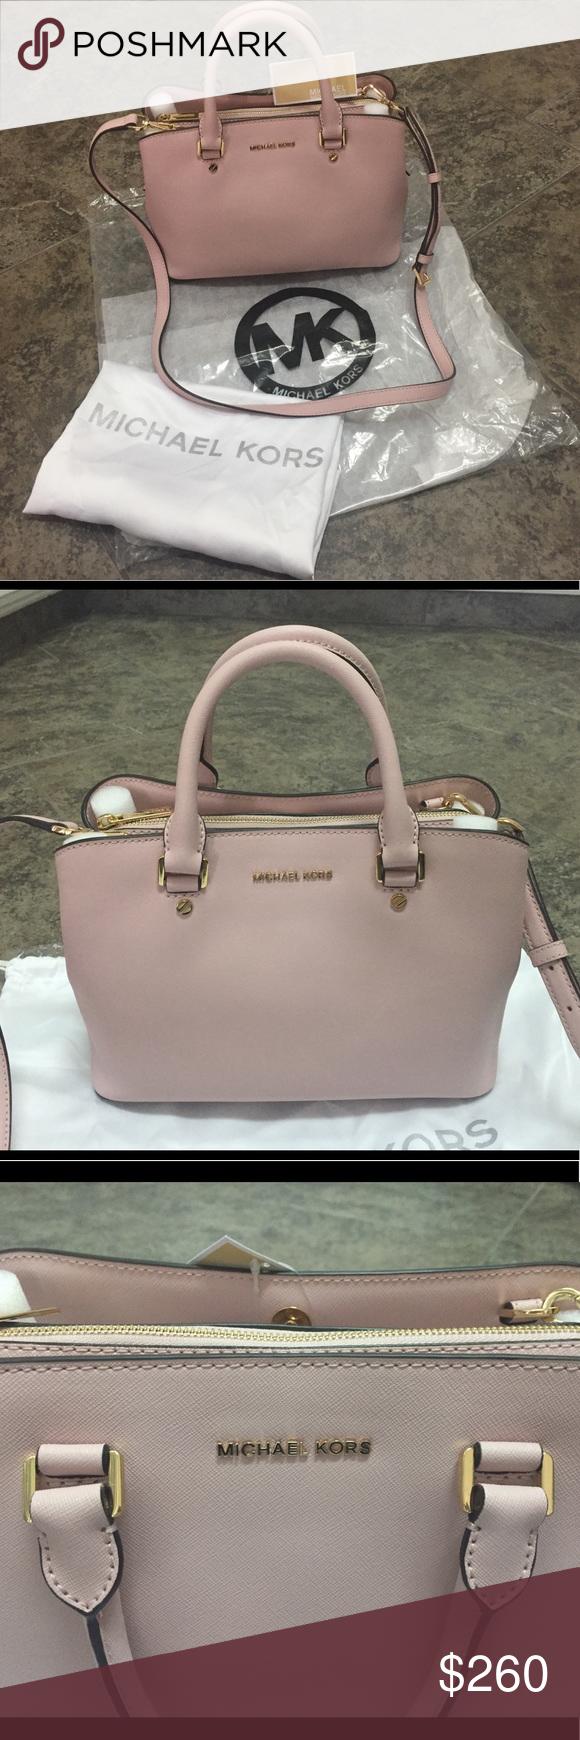 Pink Handbags Michael Kors Savannah